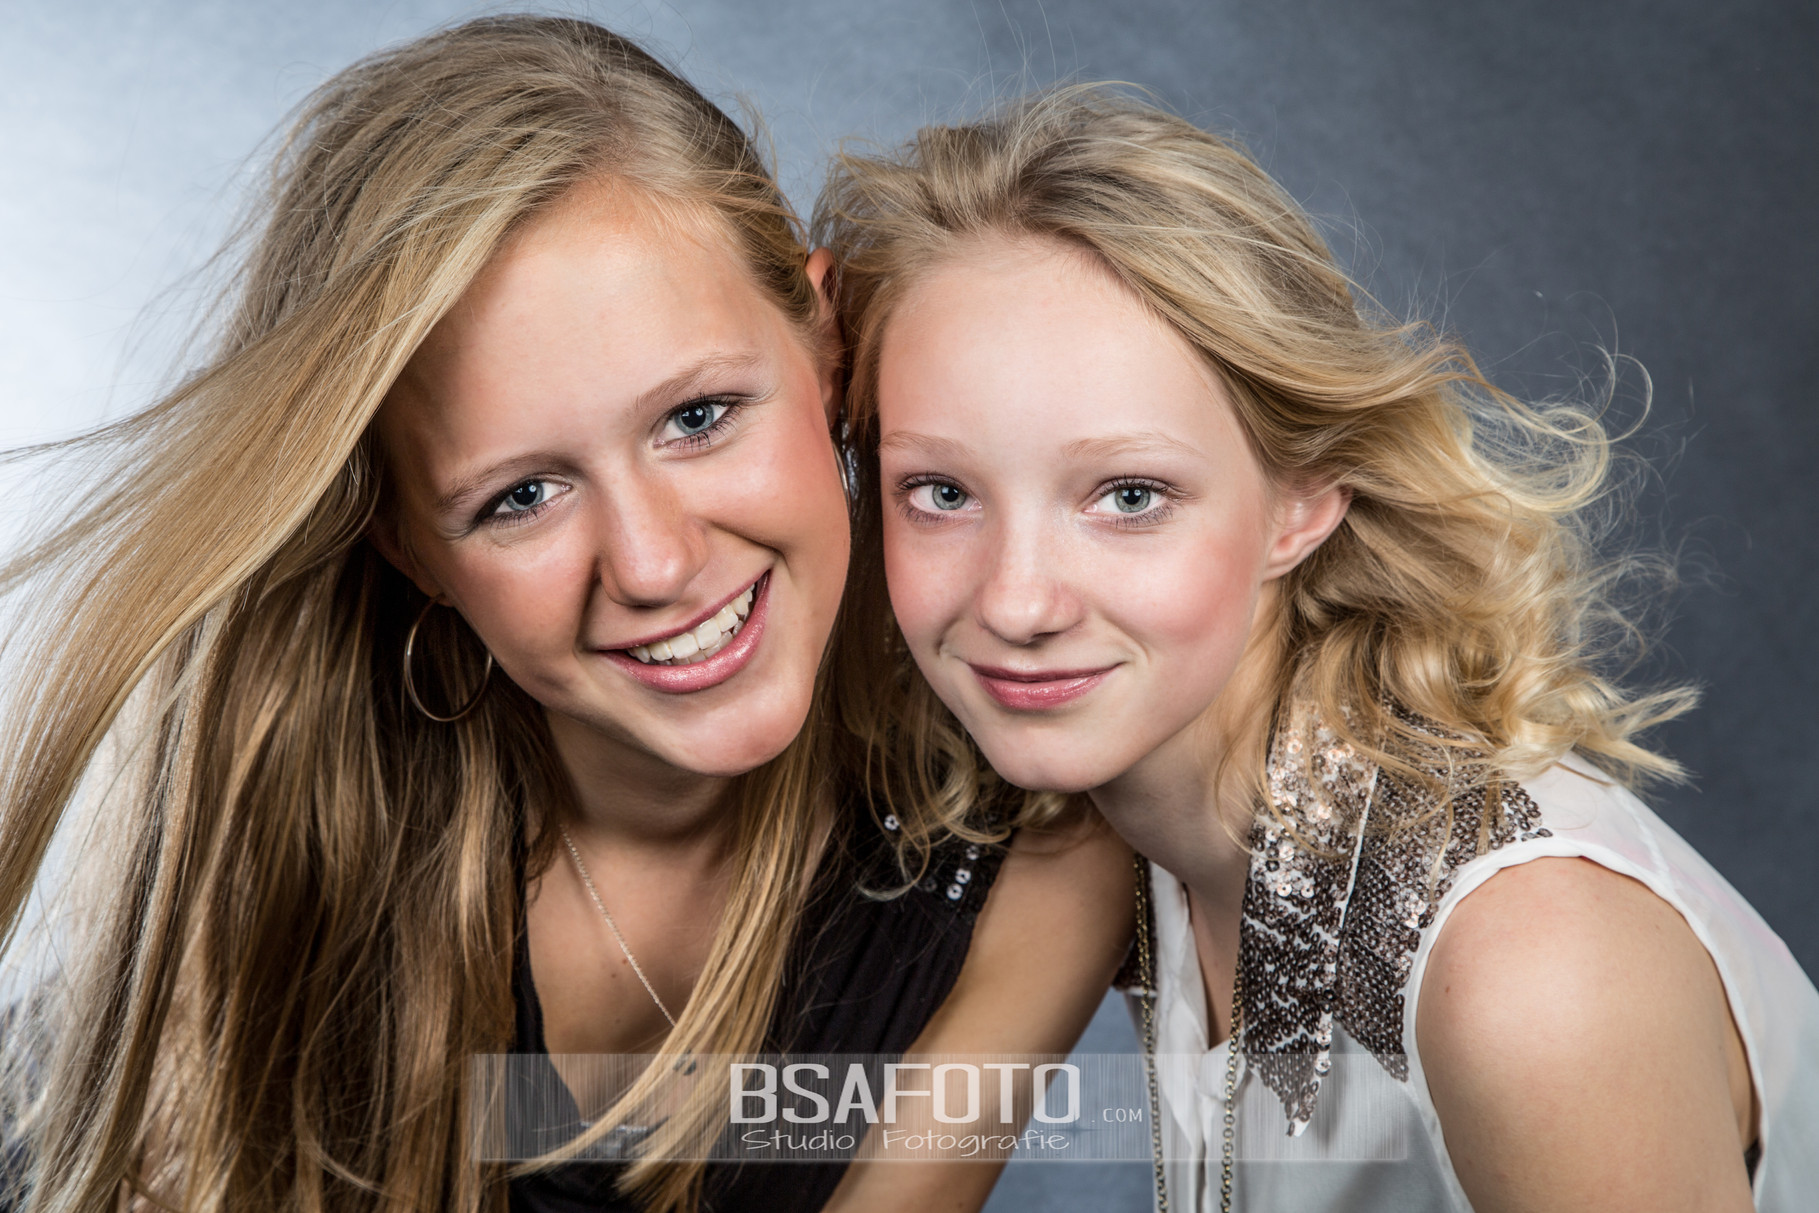 fotoshoot vriendinnen, Fotoshoot met Vriendinnen, Foto Vrienden, bsafoto.com, oosterhout,